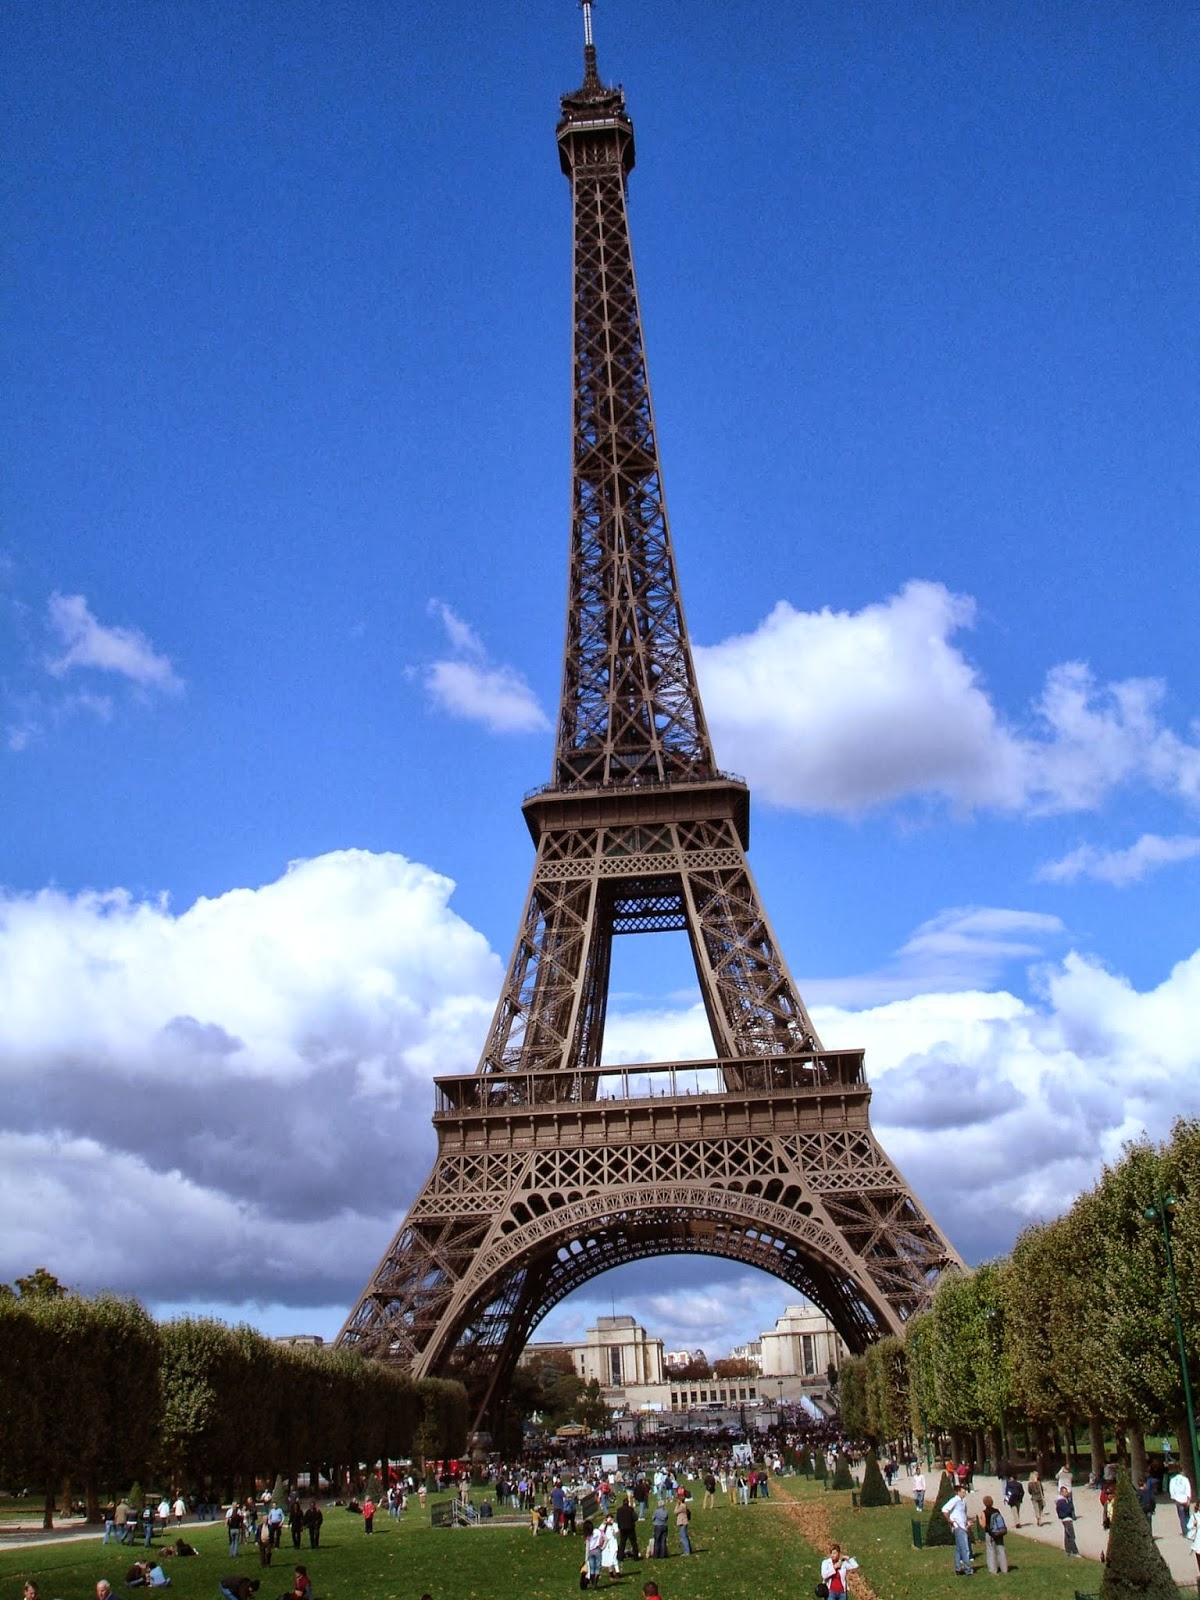 Iphone 6 Wallpaper Hd Eiffel Tower